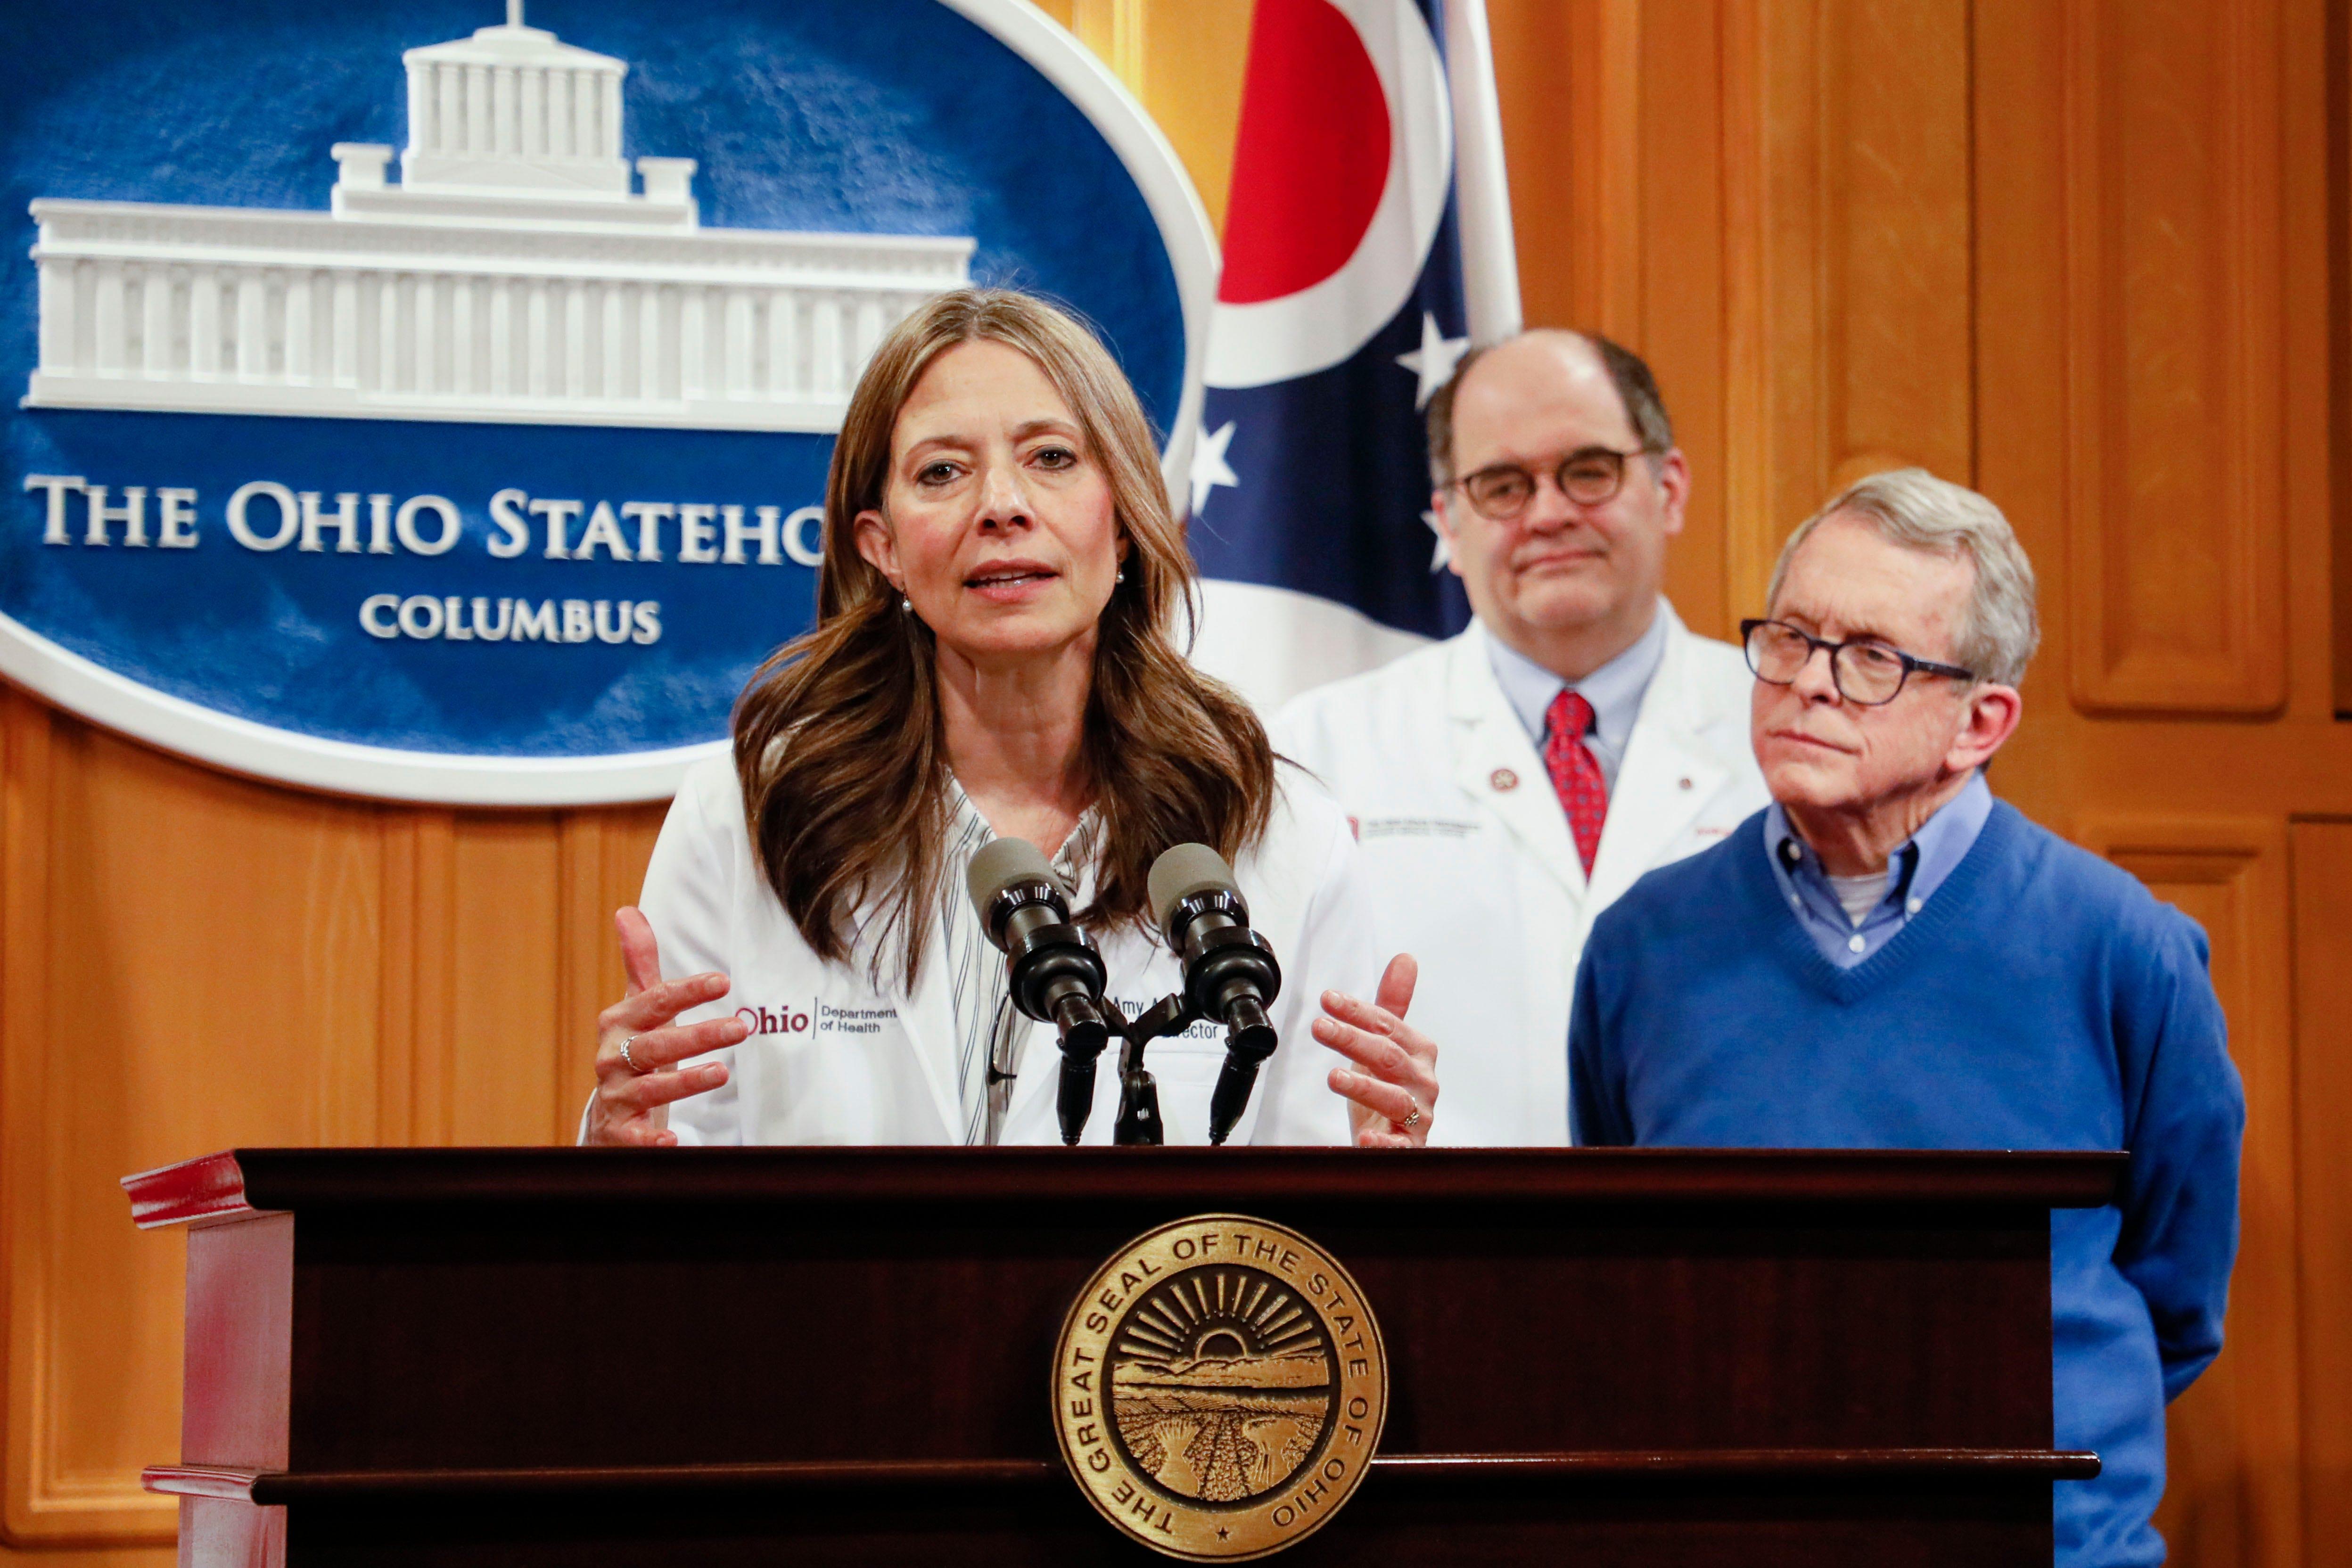 Coronavirus school closings: 33 states, Los Angeles  LAUSD, New York City shut all K-12 schools